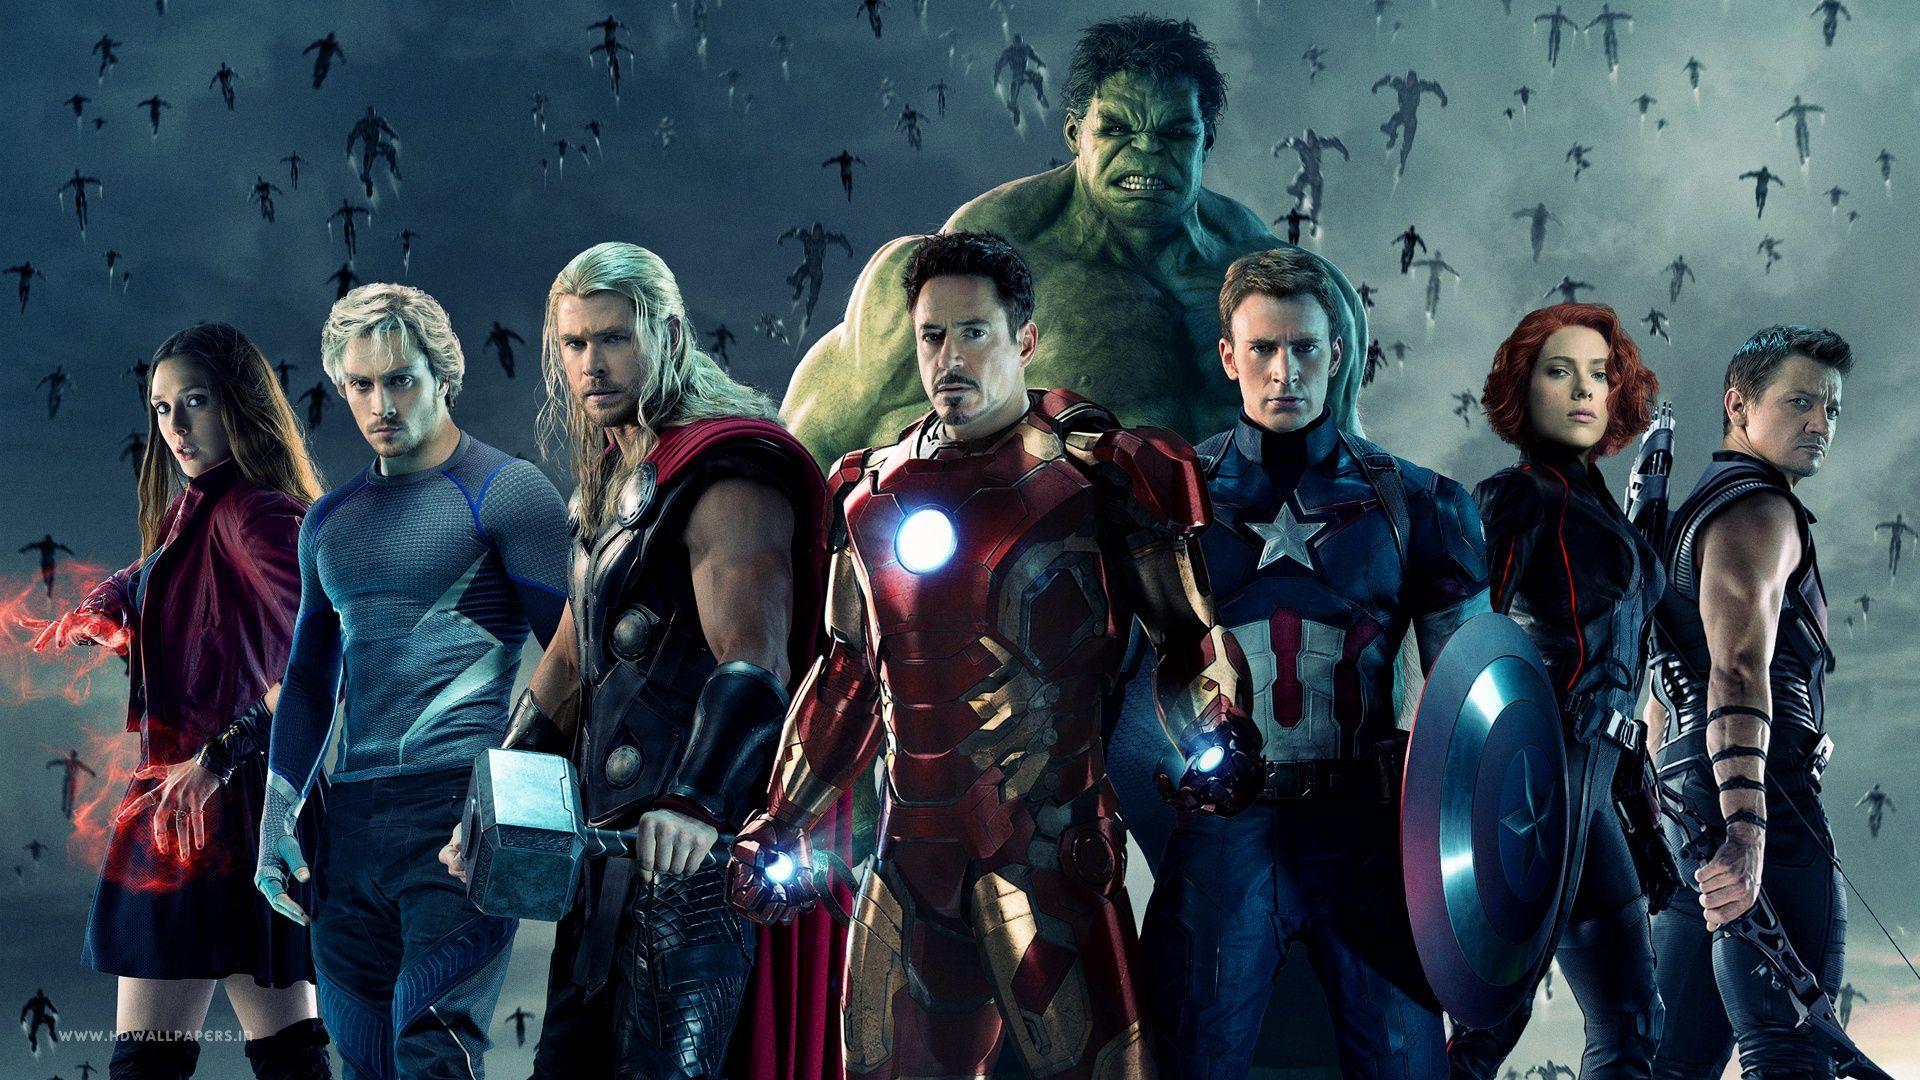 avengers hd wallpaper http://news.trestons/2015/12/30/avengers